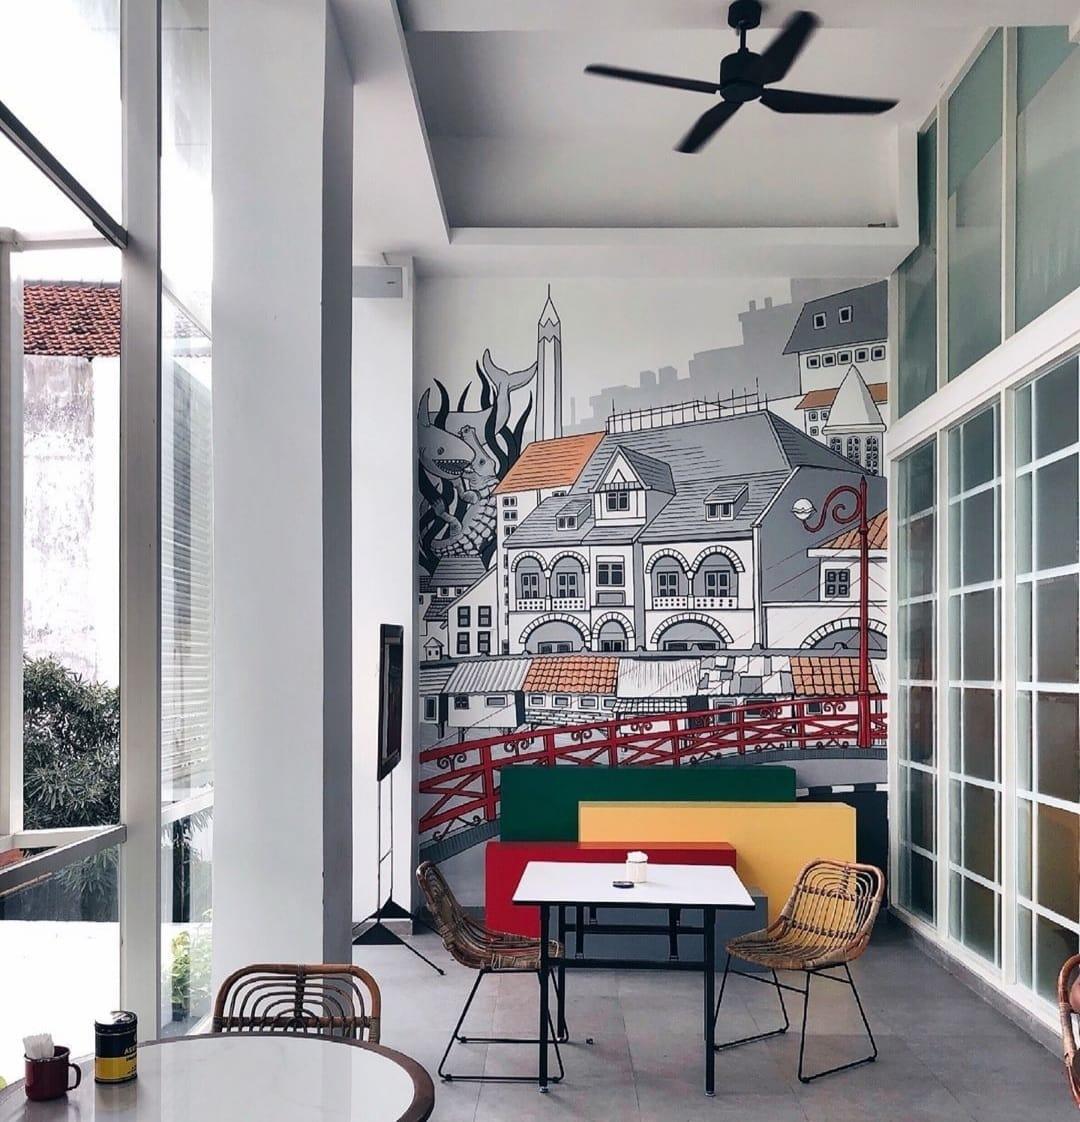 Spot Mural Kampi Hotel